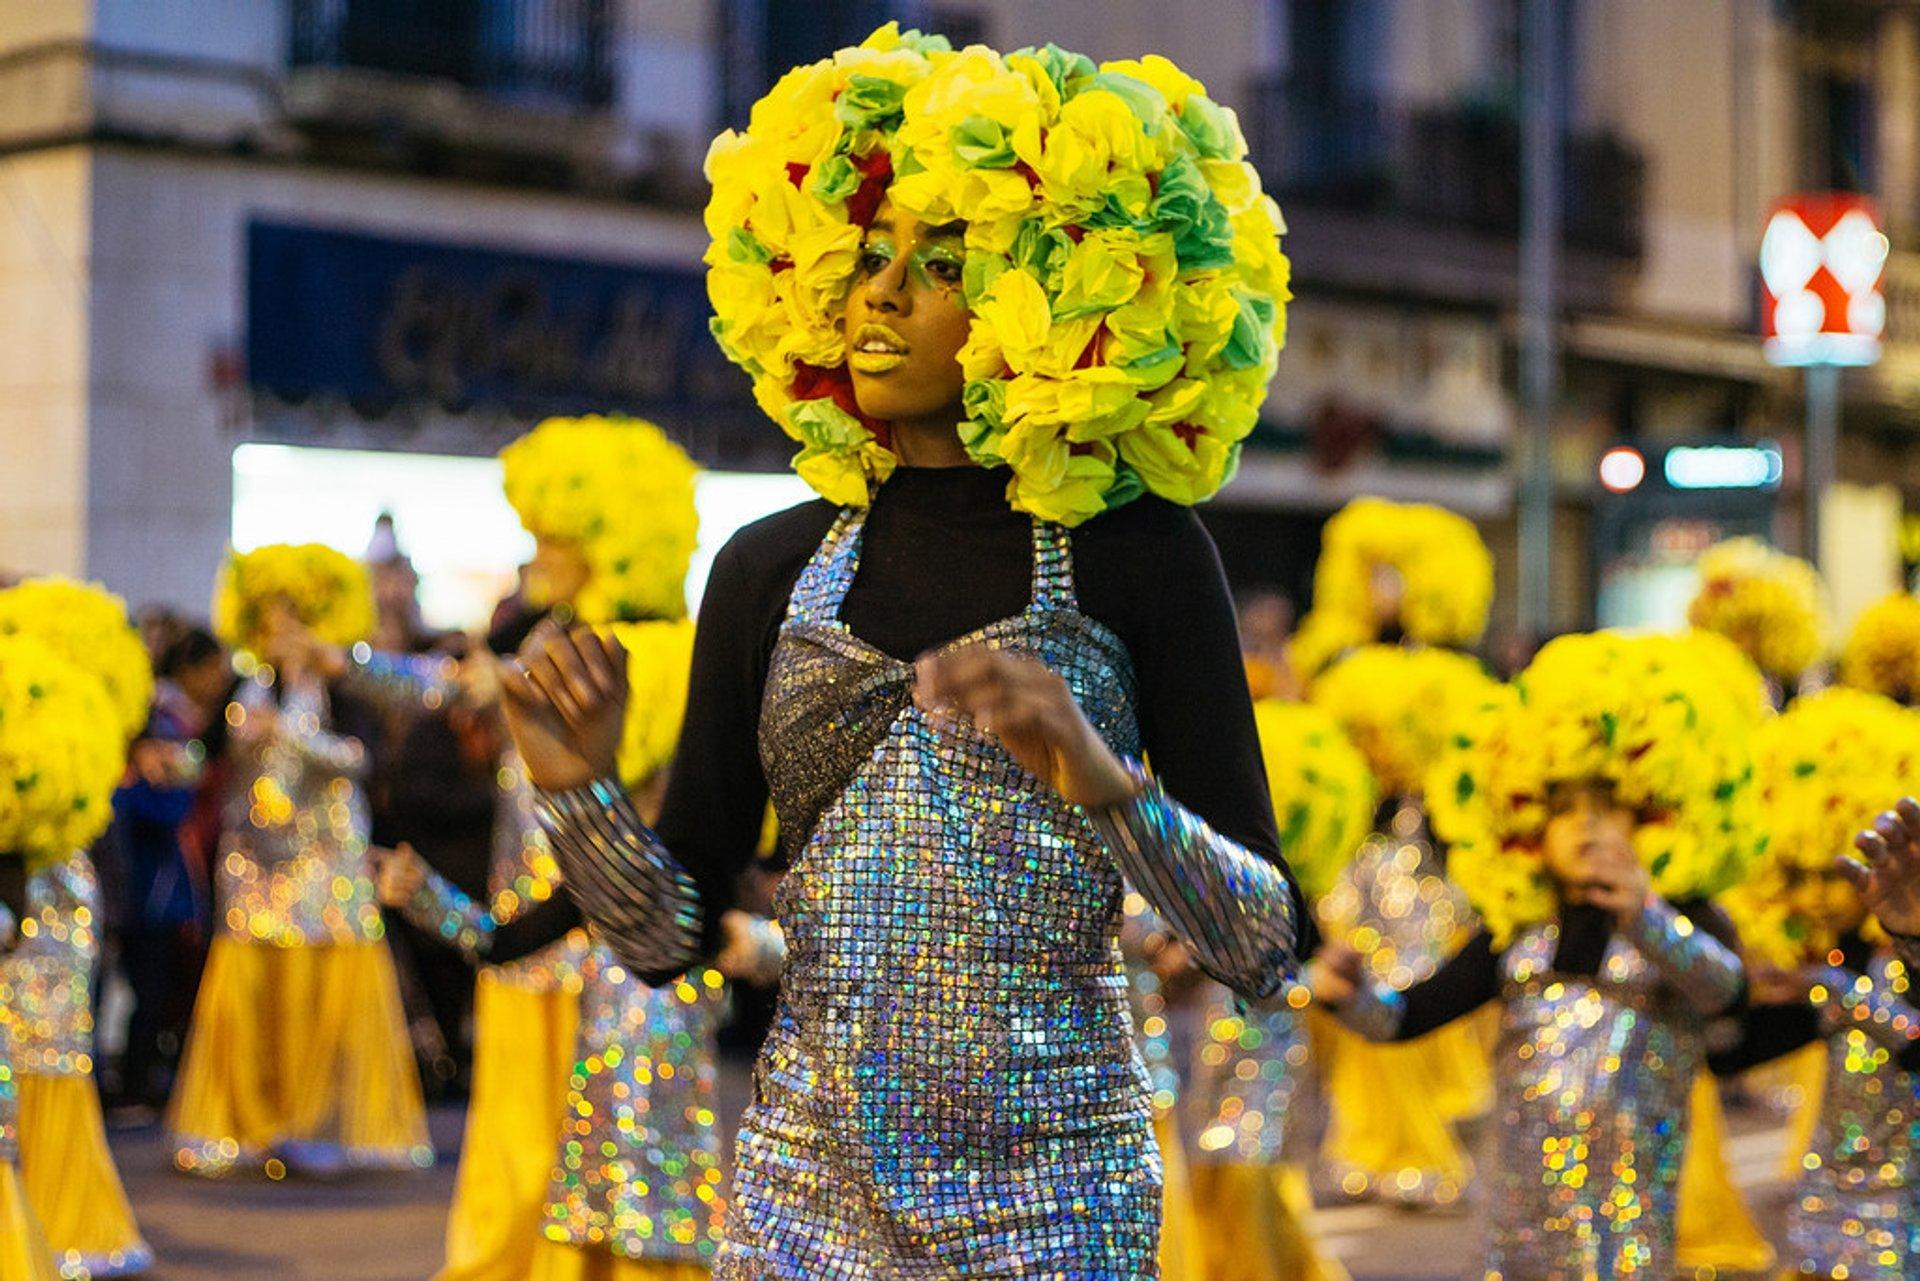 Carnaval de Barcelona in Barcelona 2020 - Best Time